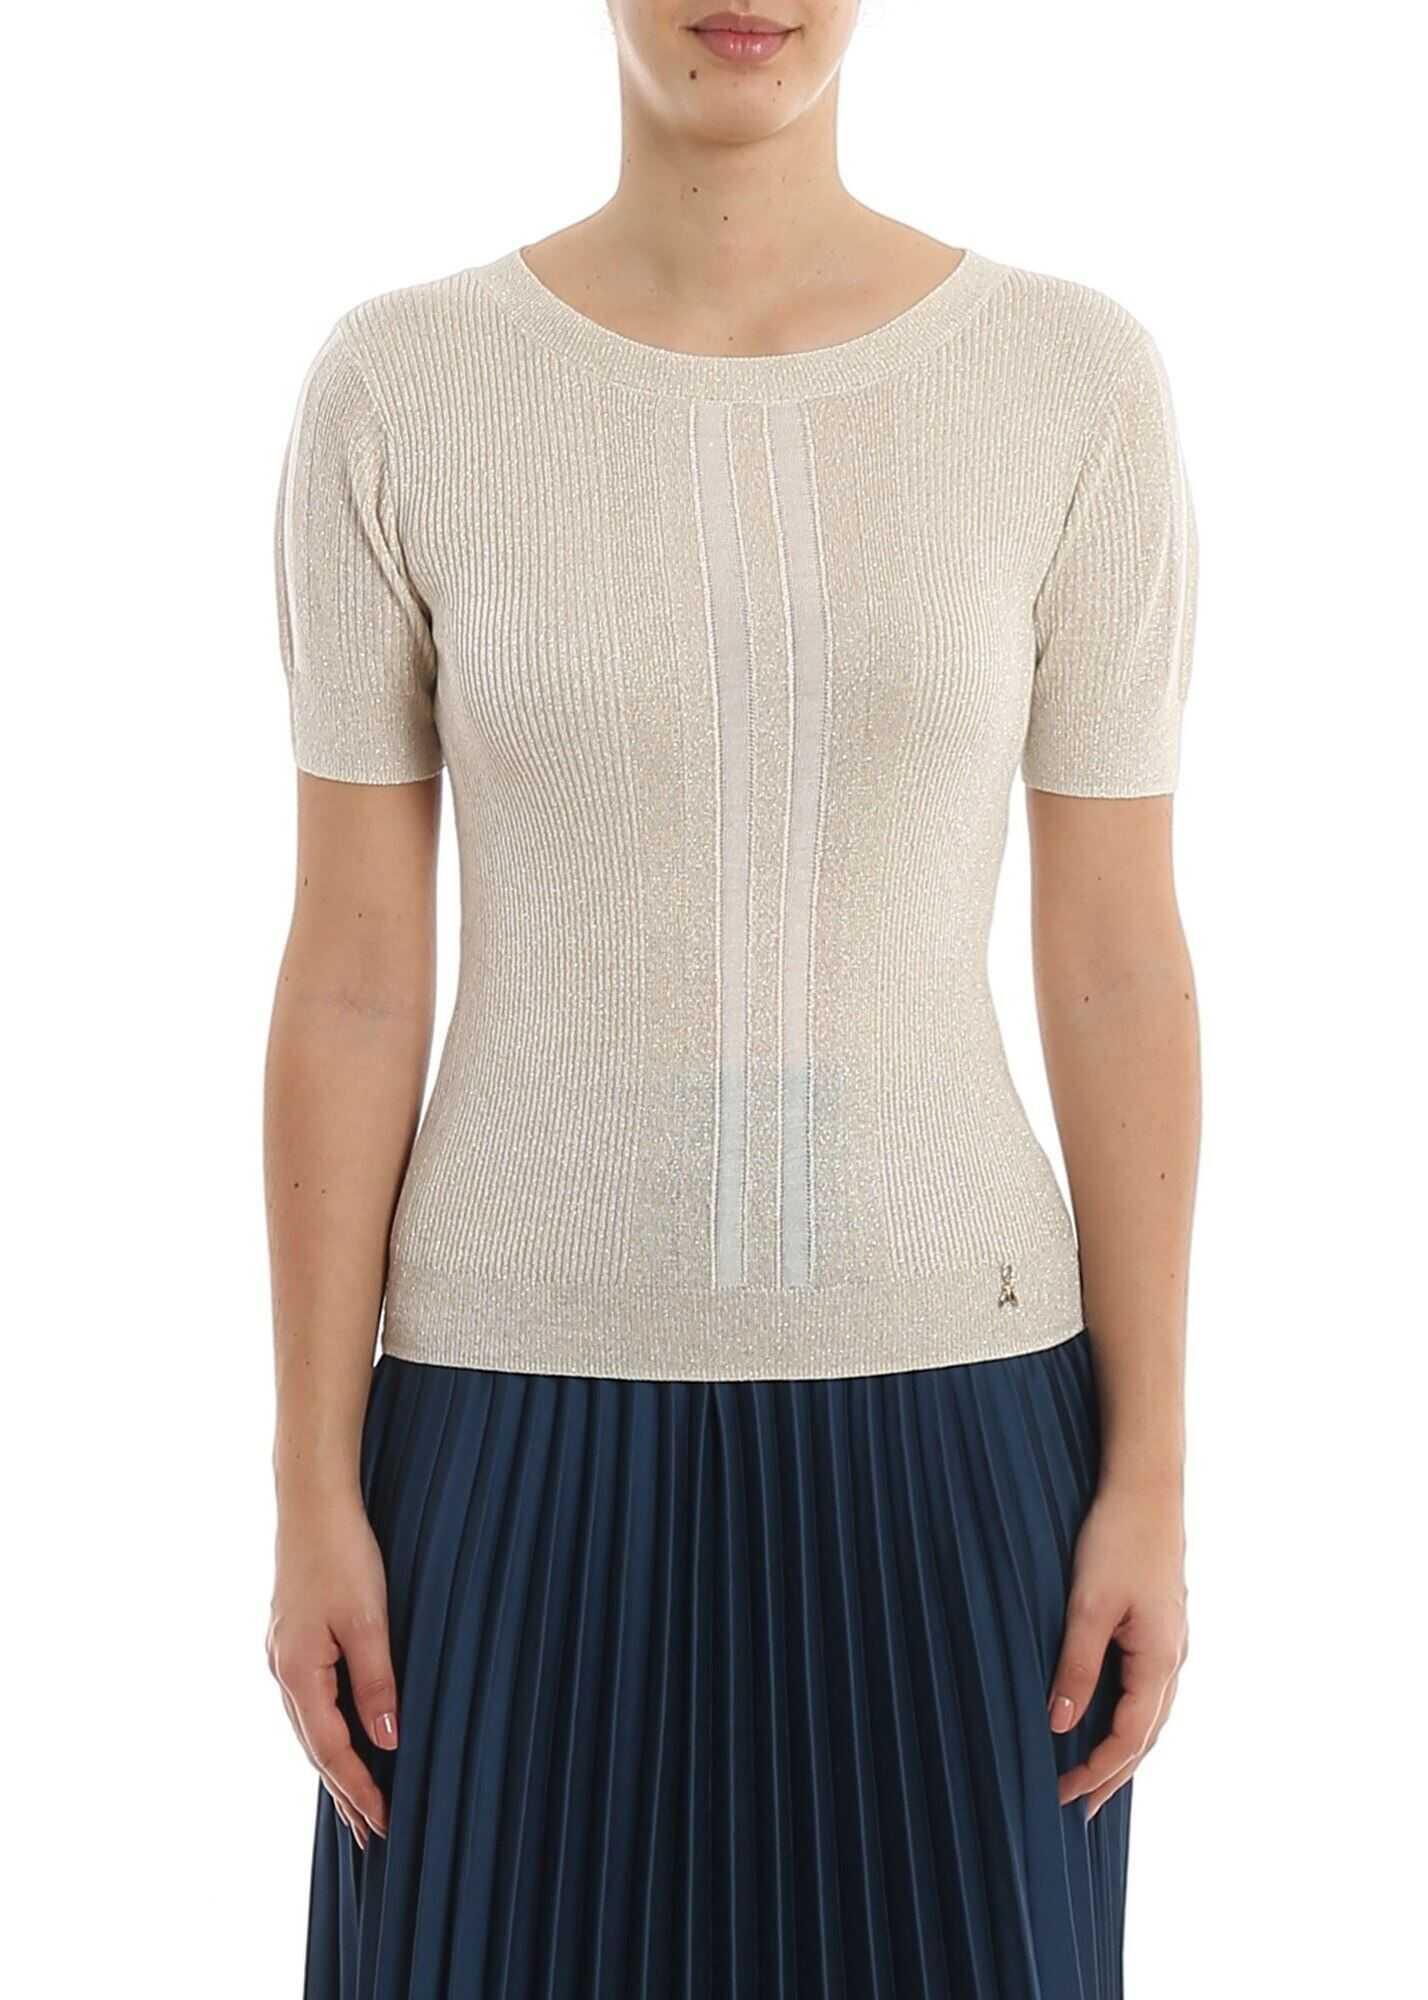 Patrizia Pepe Short Sleeved Sweater In Cream Color Cream